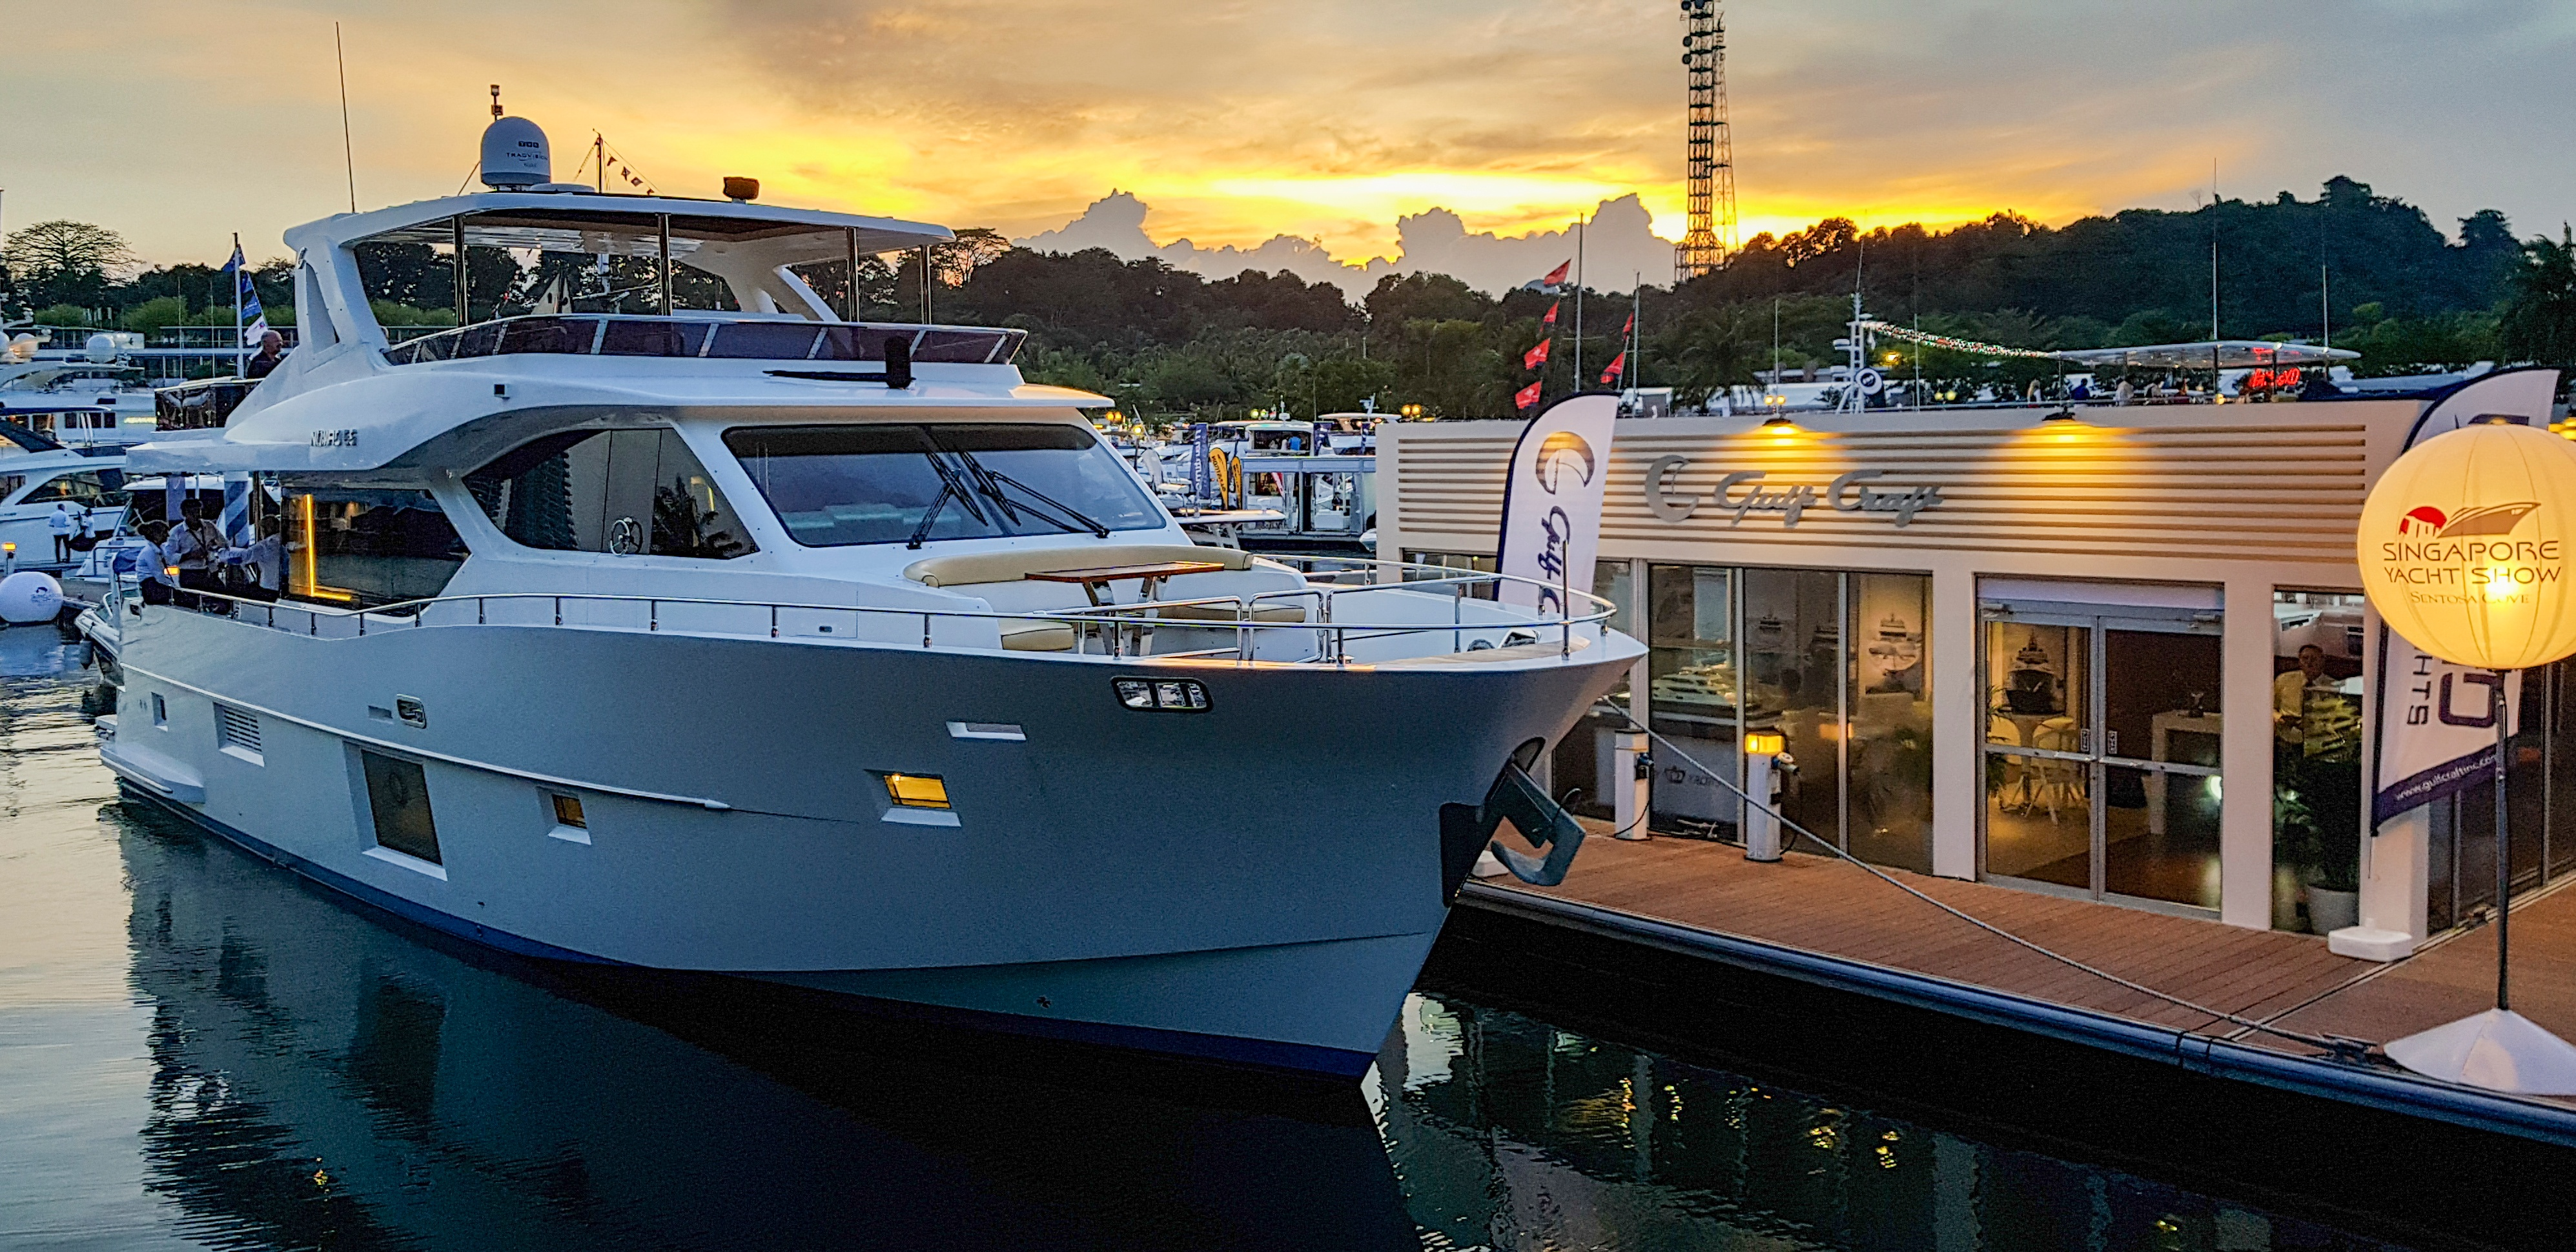 Gulf Craft at Singapore Yacht Show 2018 Day 1 (12).jpg